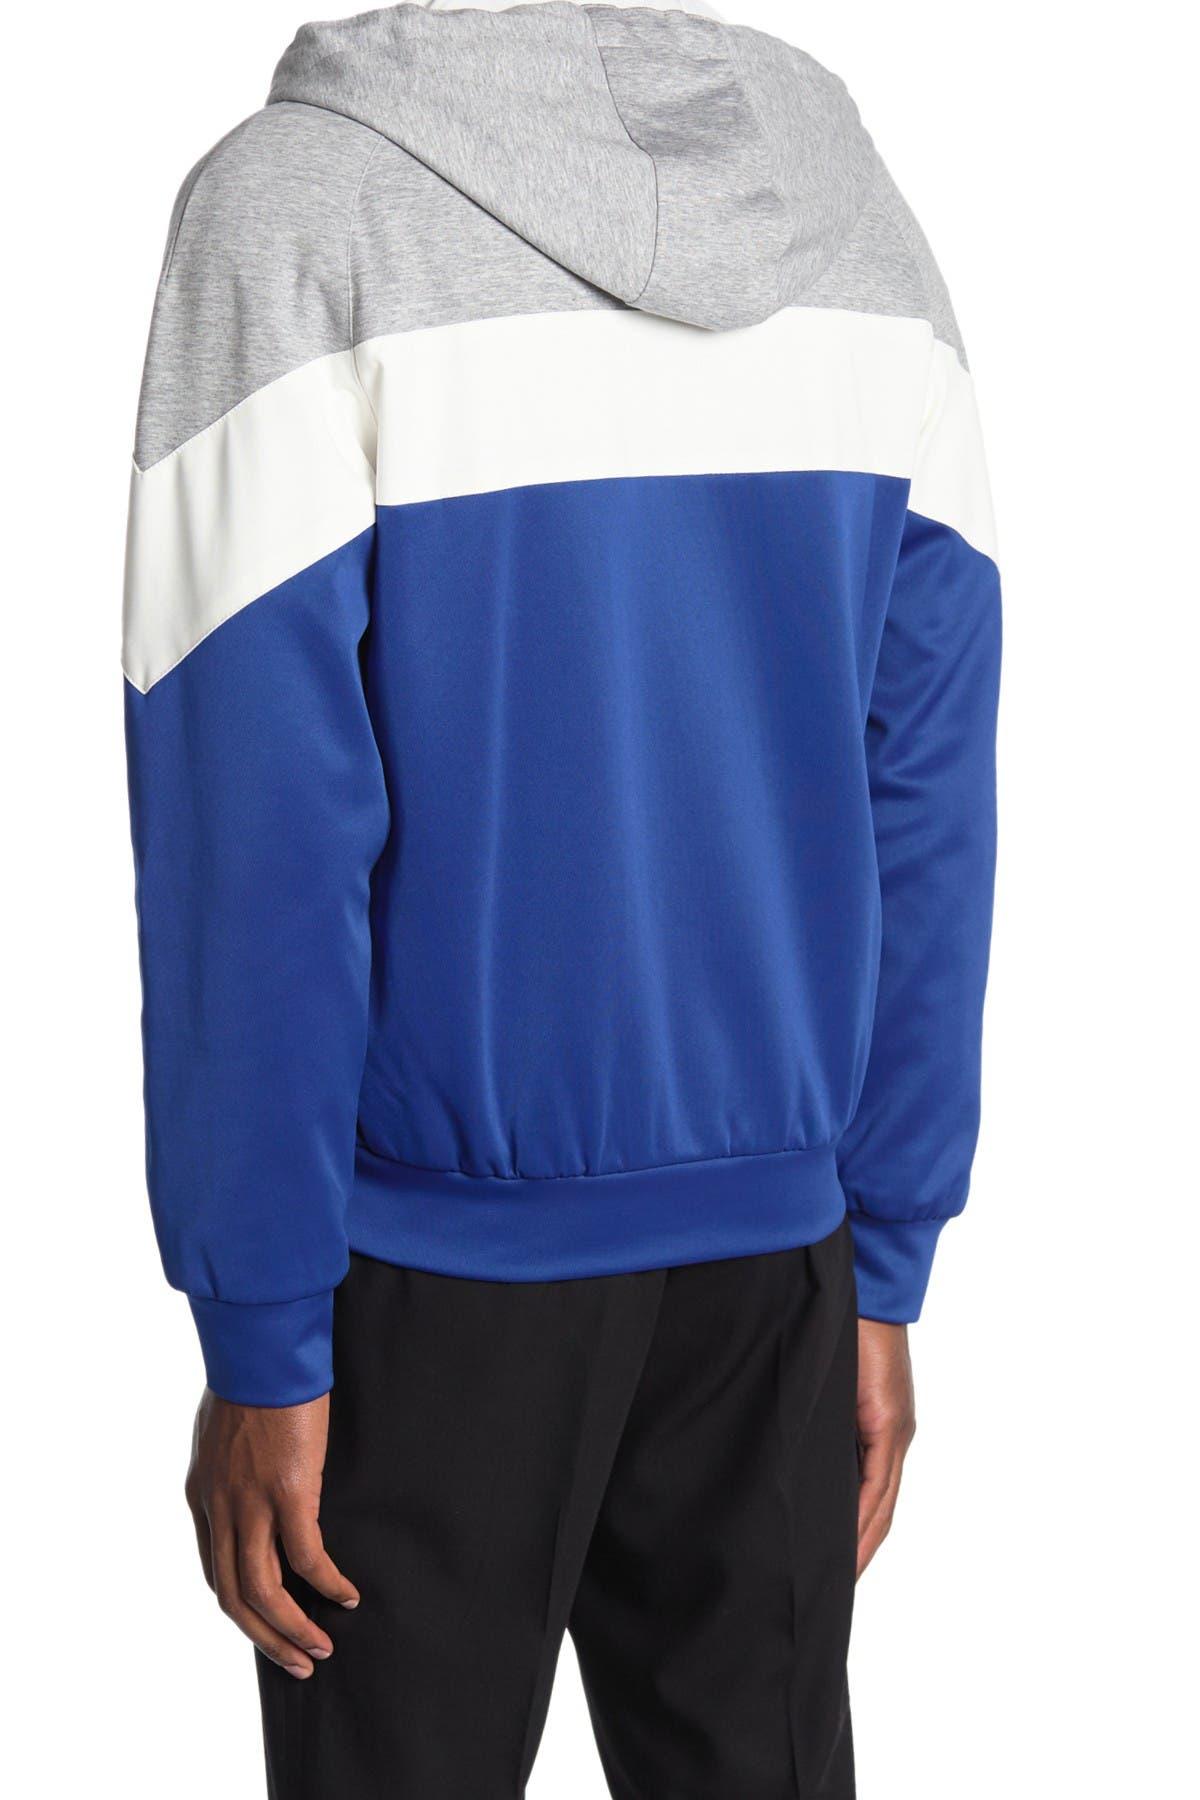 Image of Bugatchi Colorblock Full Zip Knit Hoodie Jacket